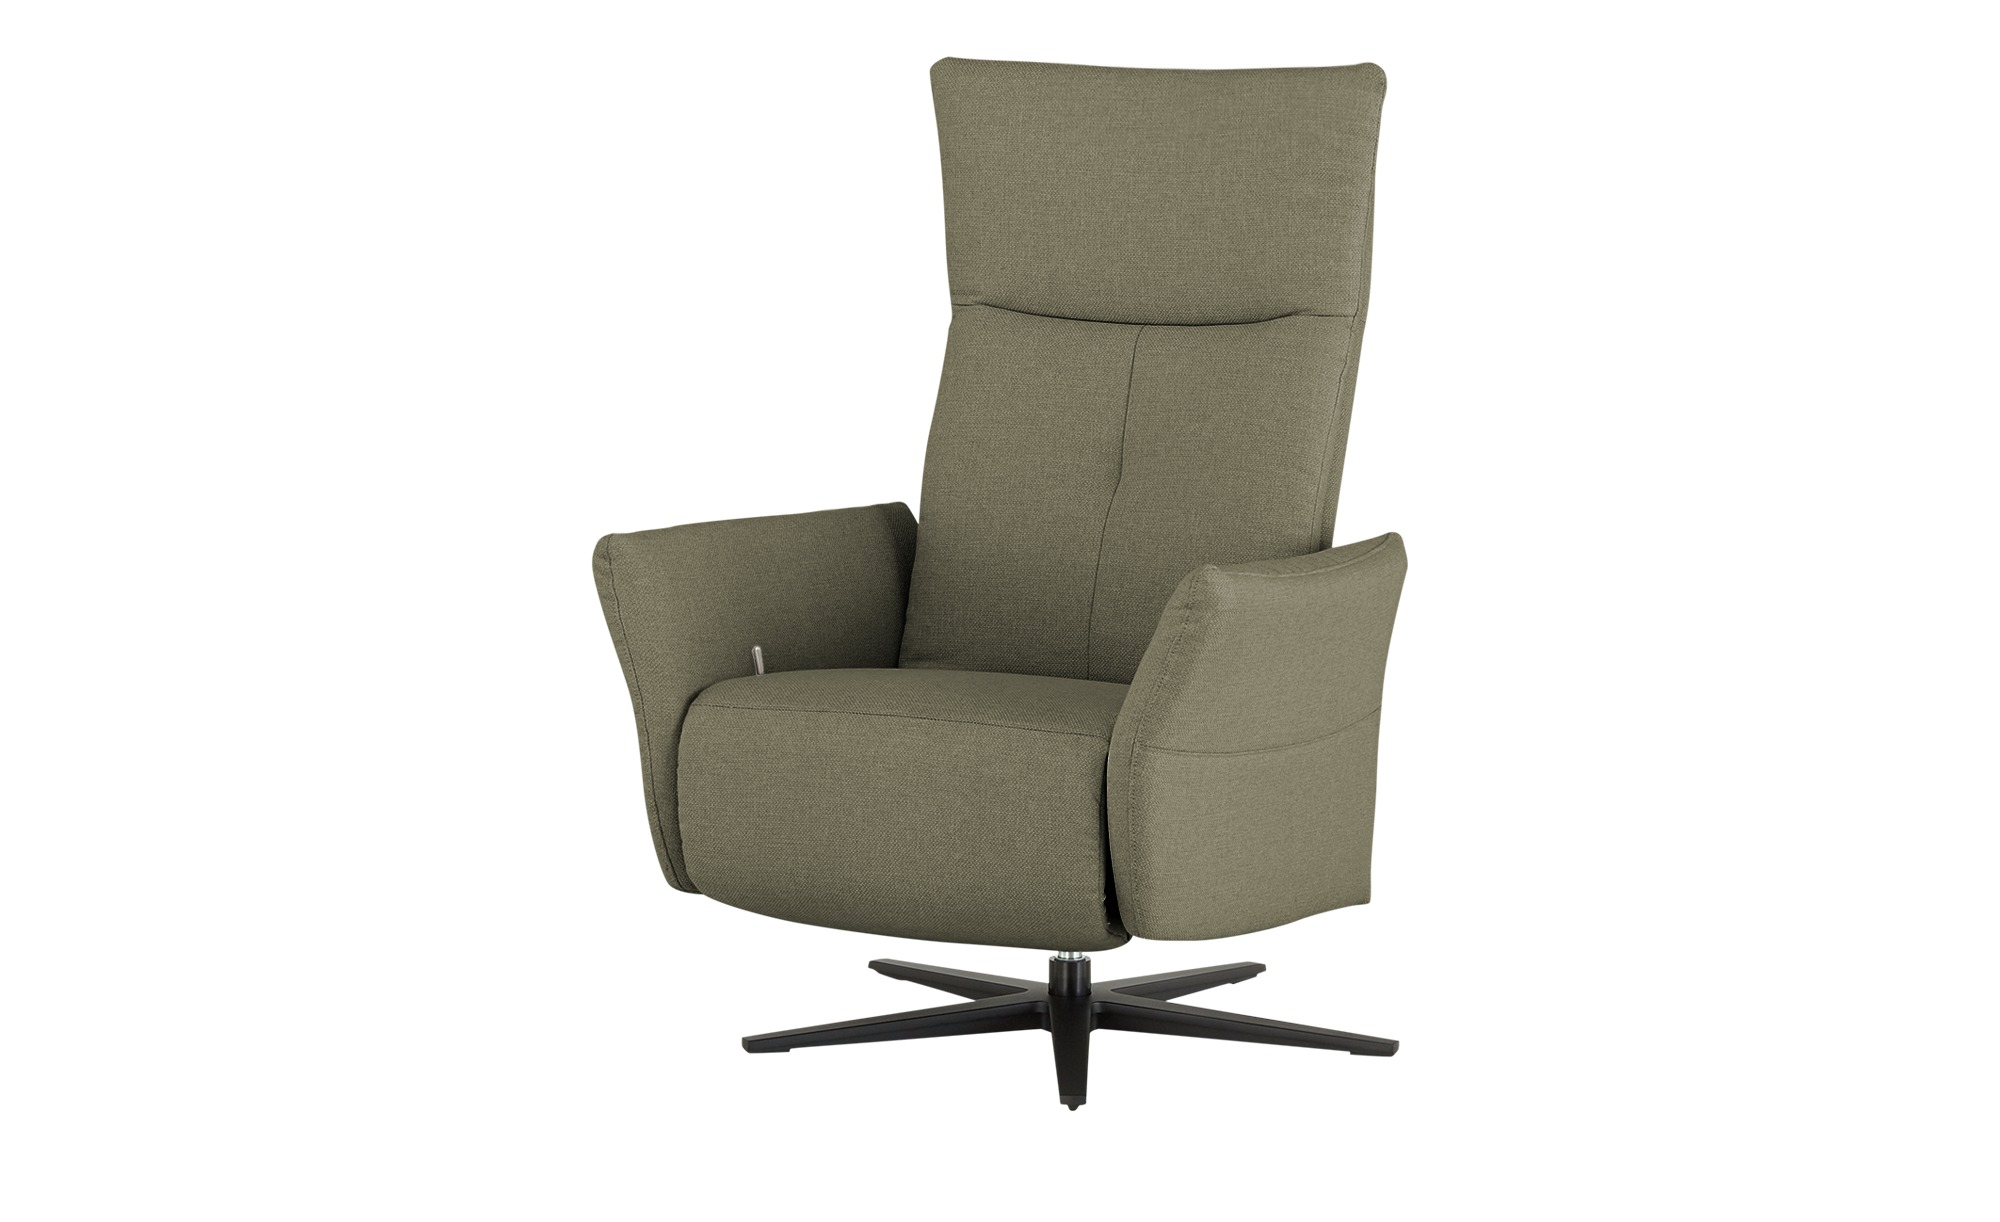 Wohnwert Funktionssessel  Katja ¦ grün ¦ Maße (cm): B: 79 H: 110 T: 80 Polstermöbel > Sessel > Drehsessel - Höffner